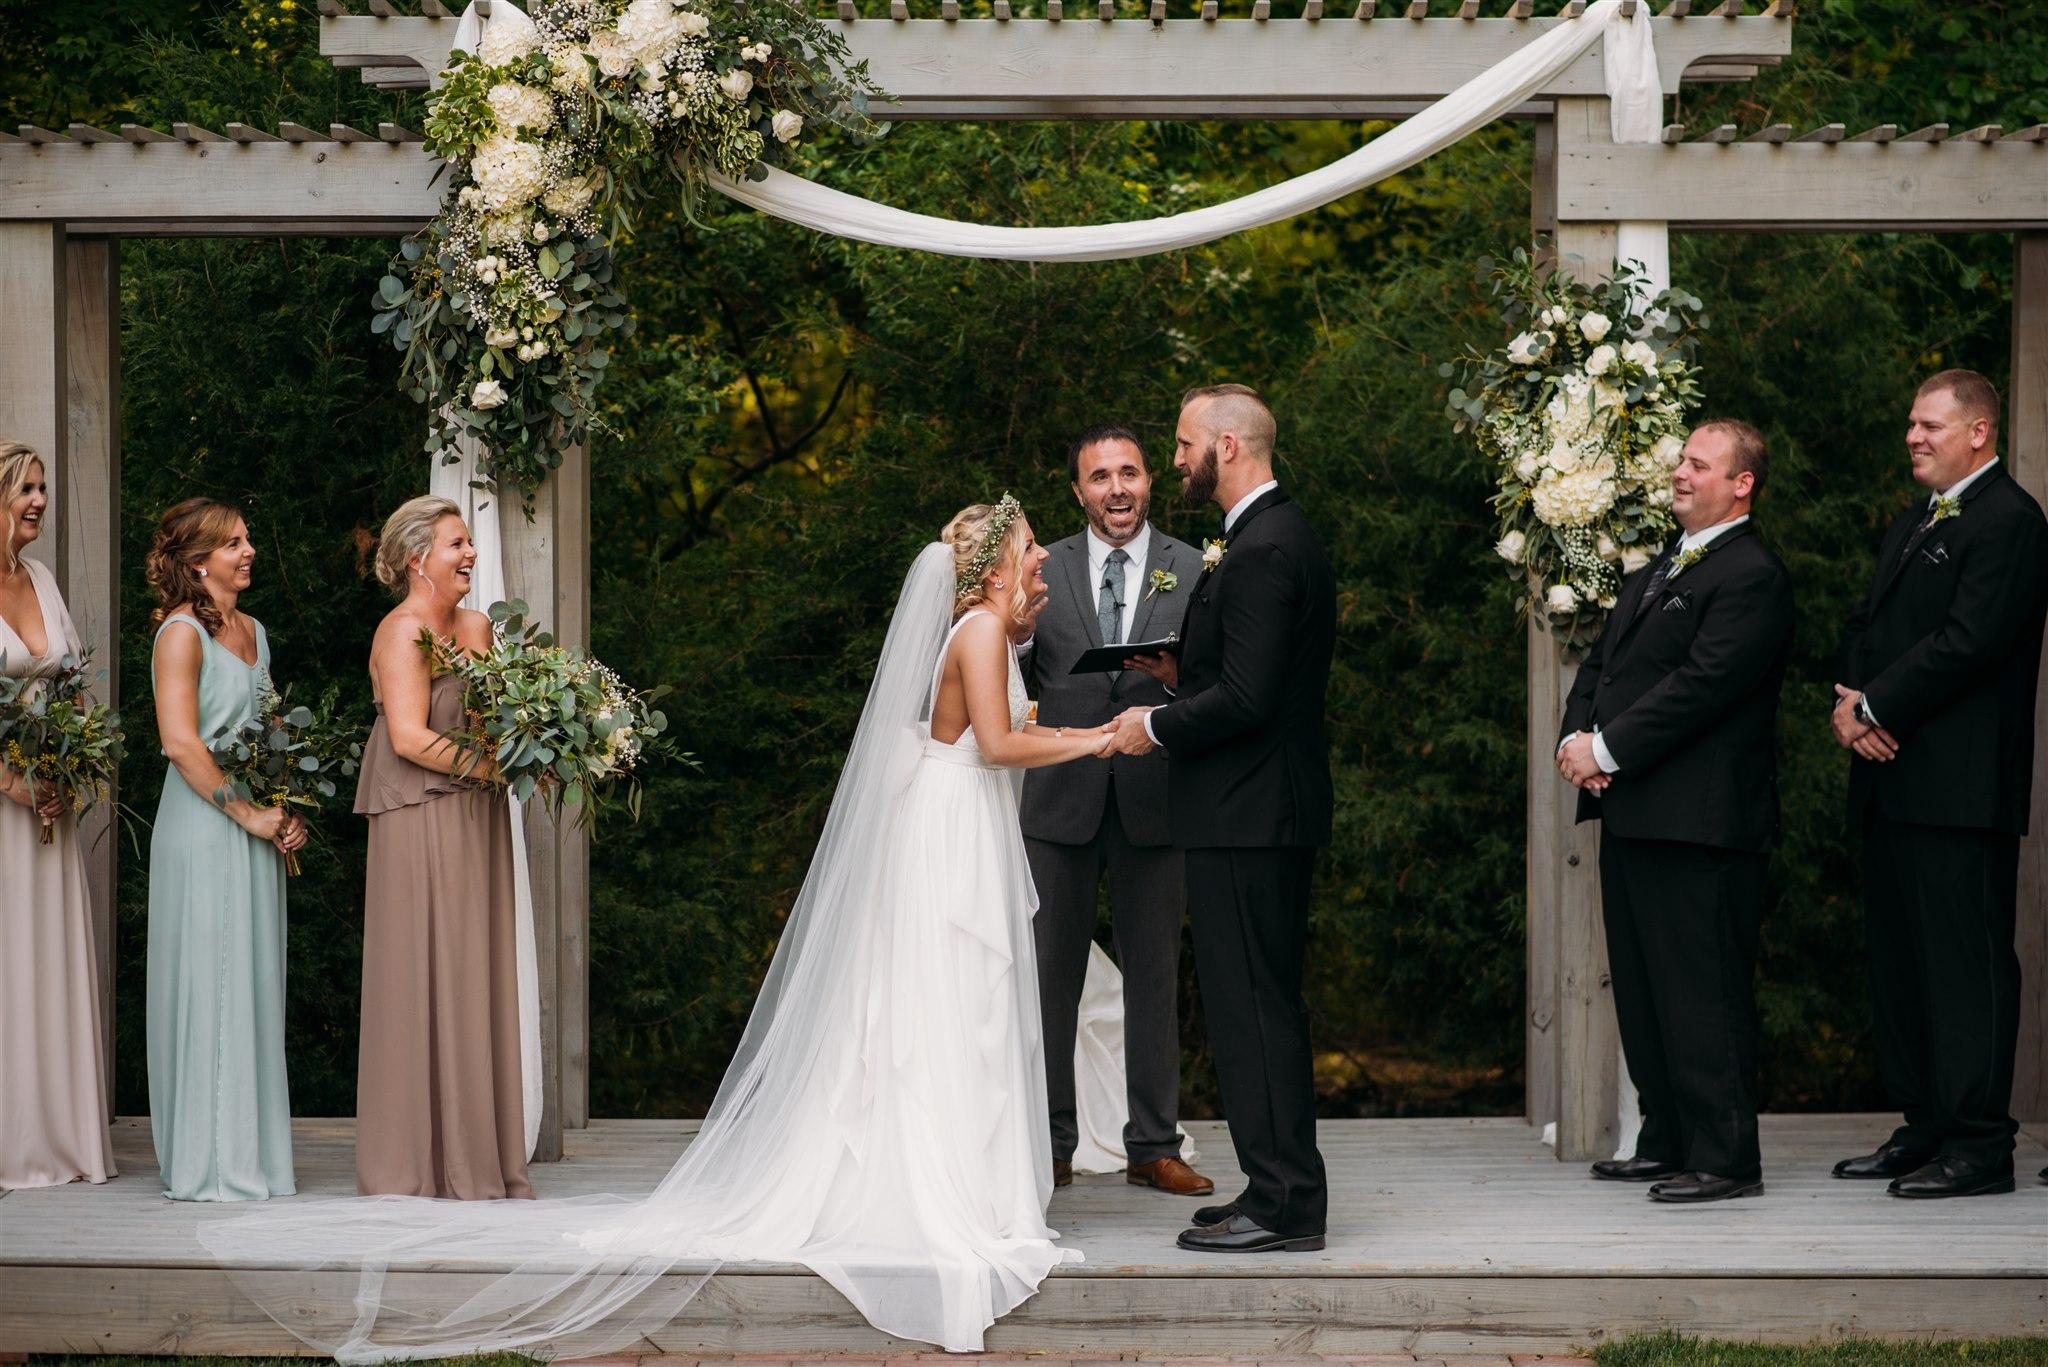 Shannon _ Tim -6101.jpgCedar Grove Acres Wedding - Raleigh Wedding Photographer - North Carolina Wedding Photographer - Creedmoor Wedding Photographer - Summer Wedding